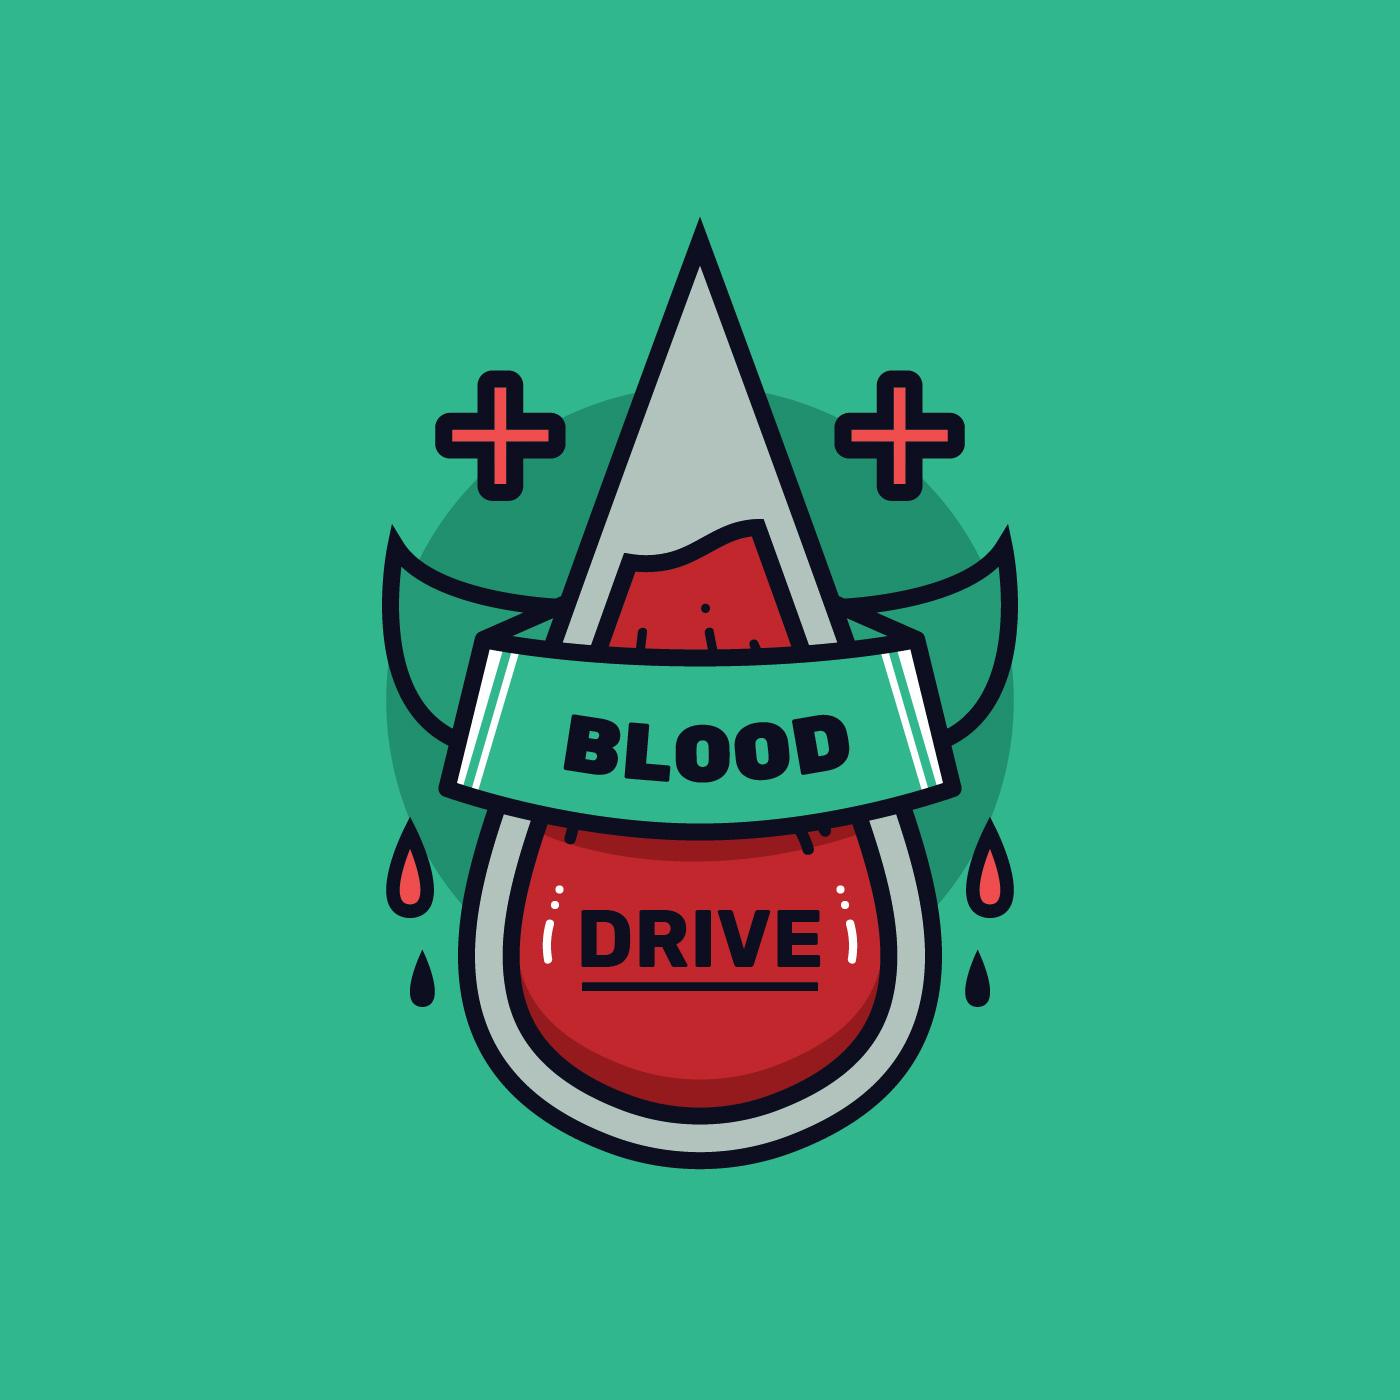 Blood Drive Badge Vector